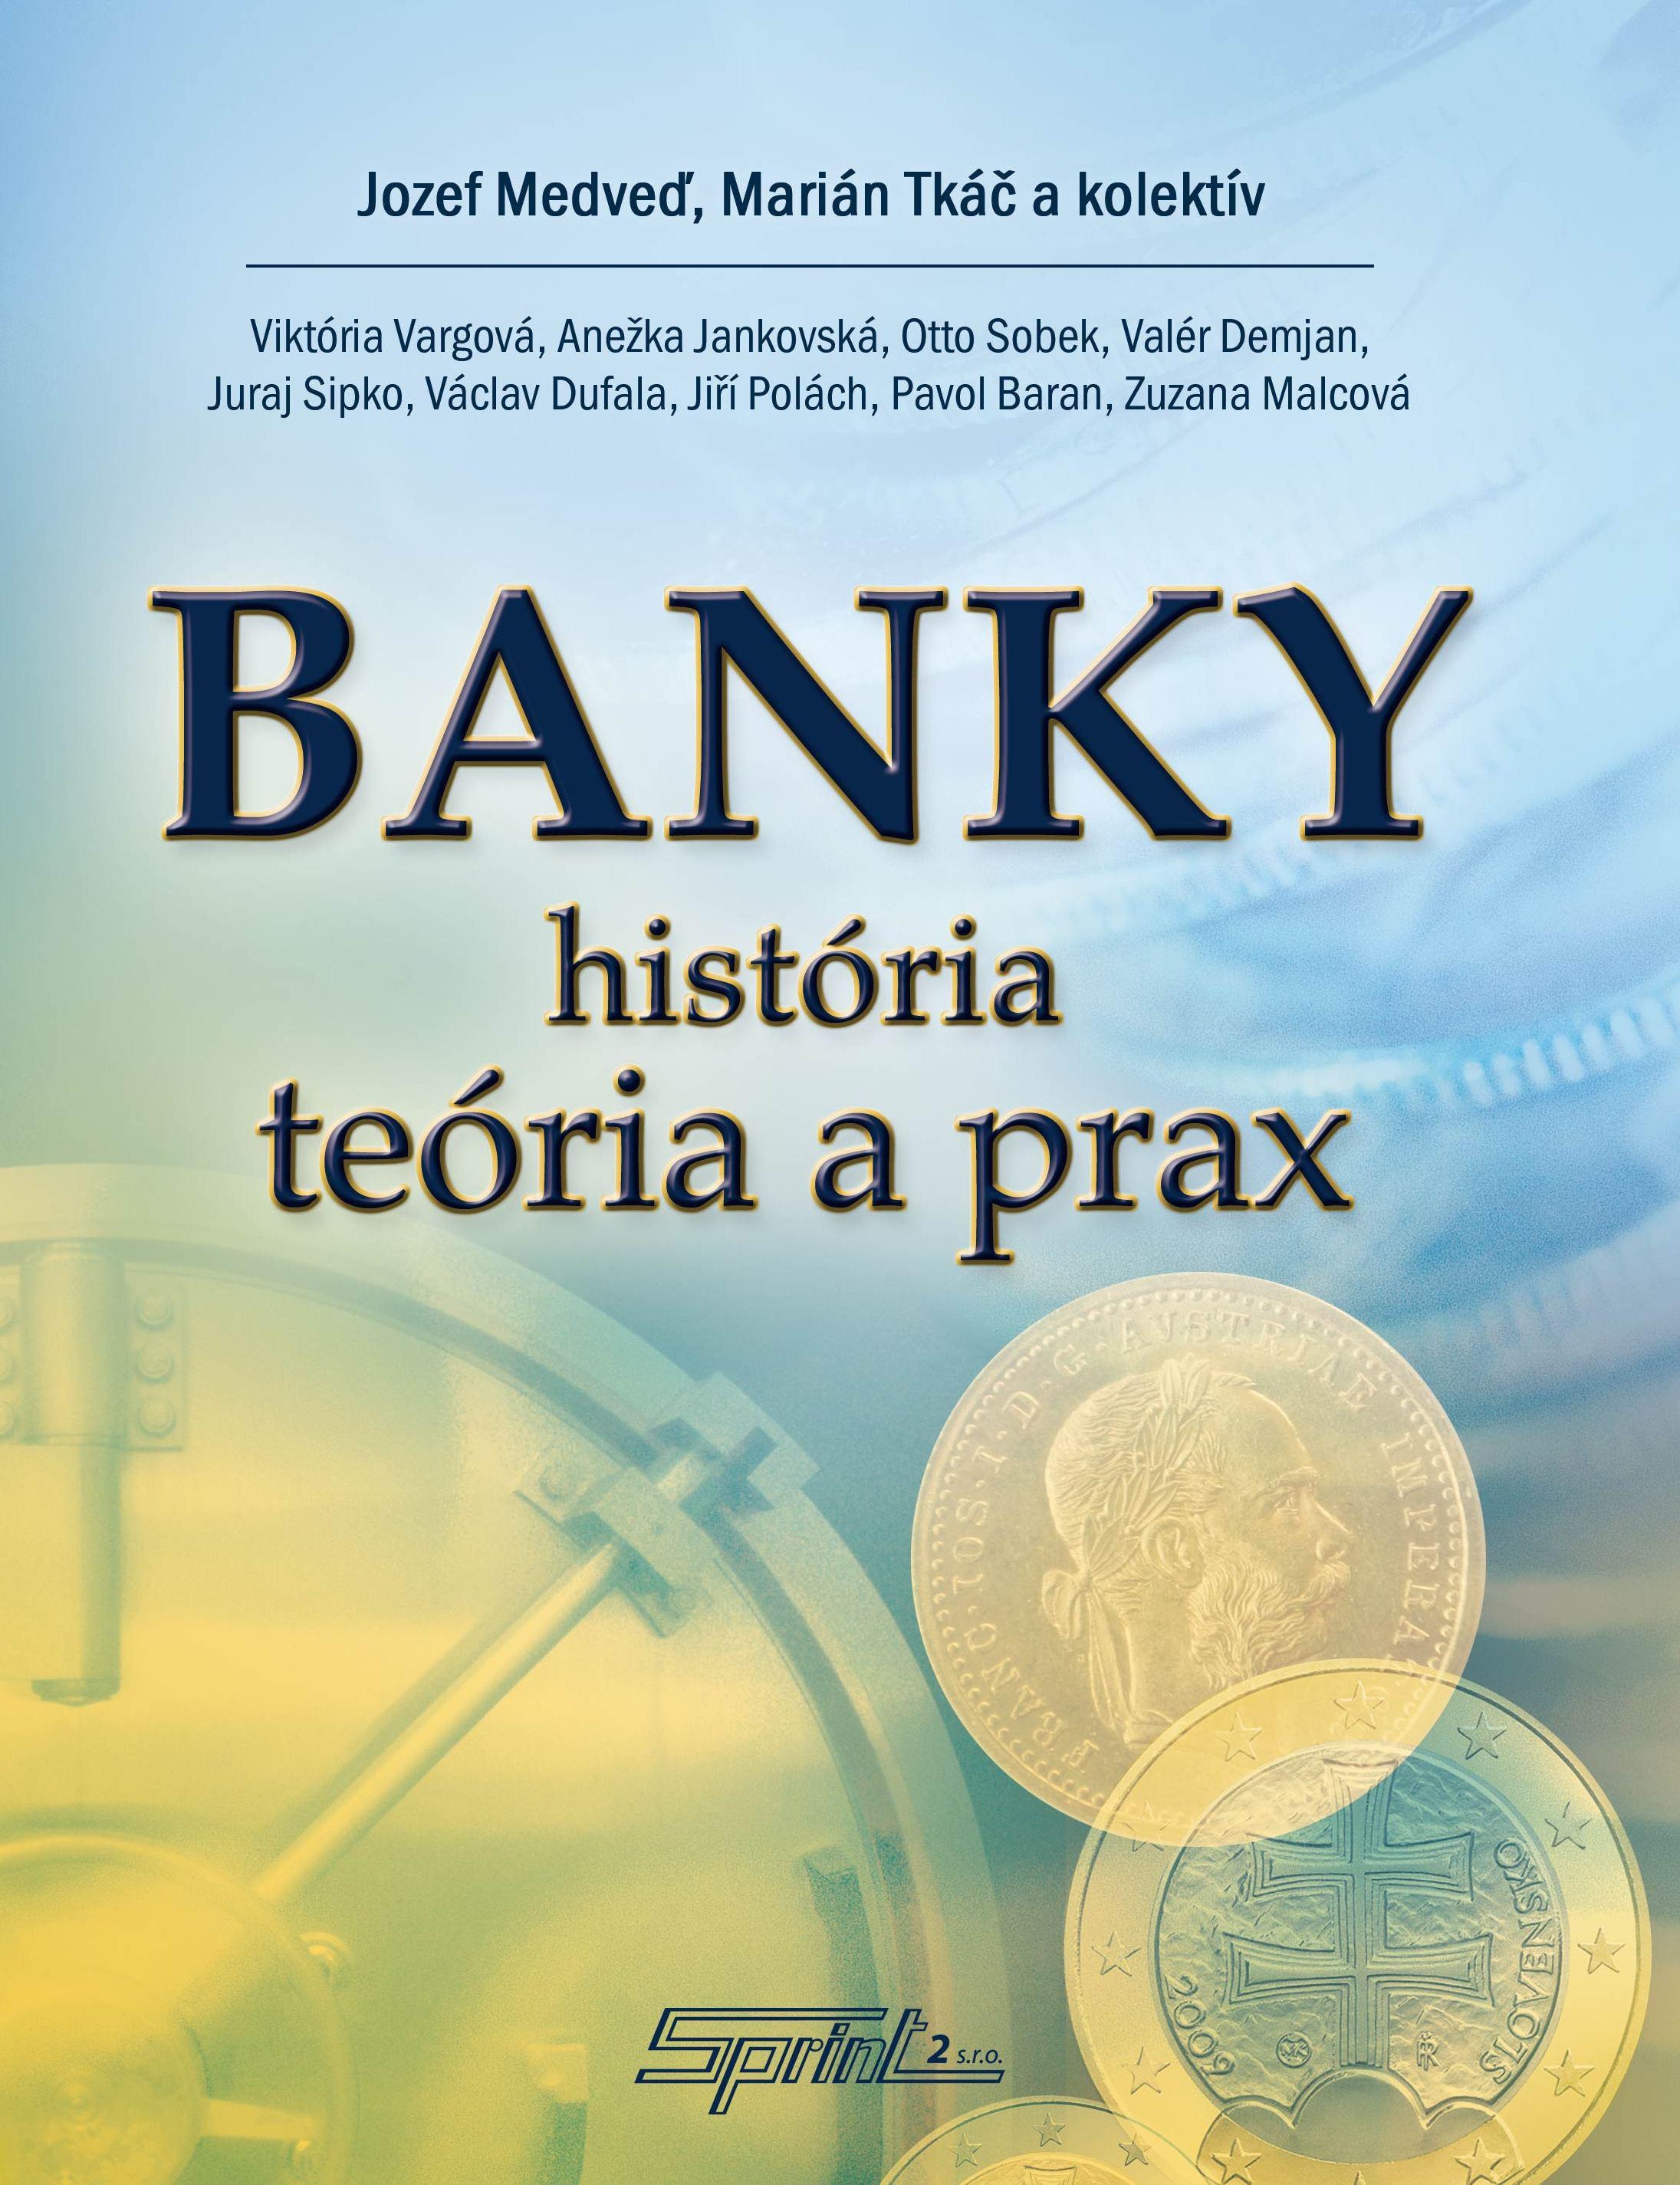 Banky